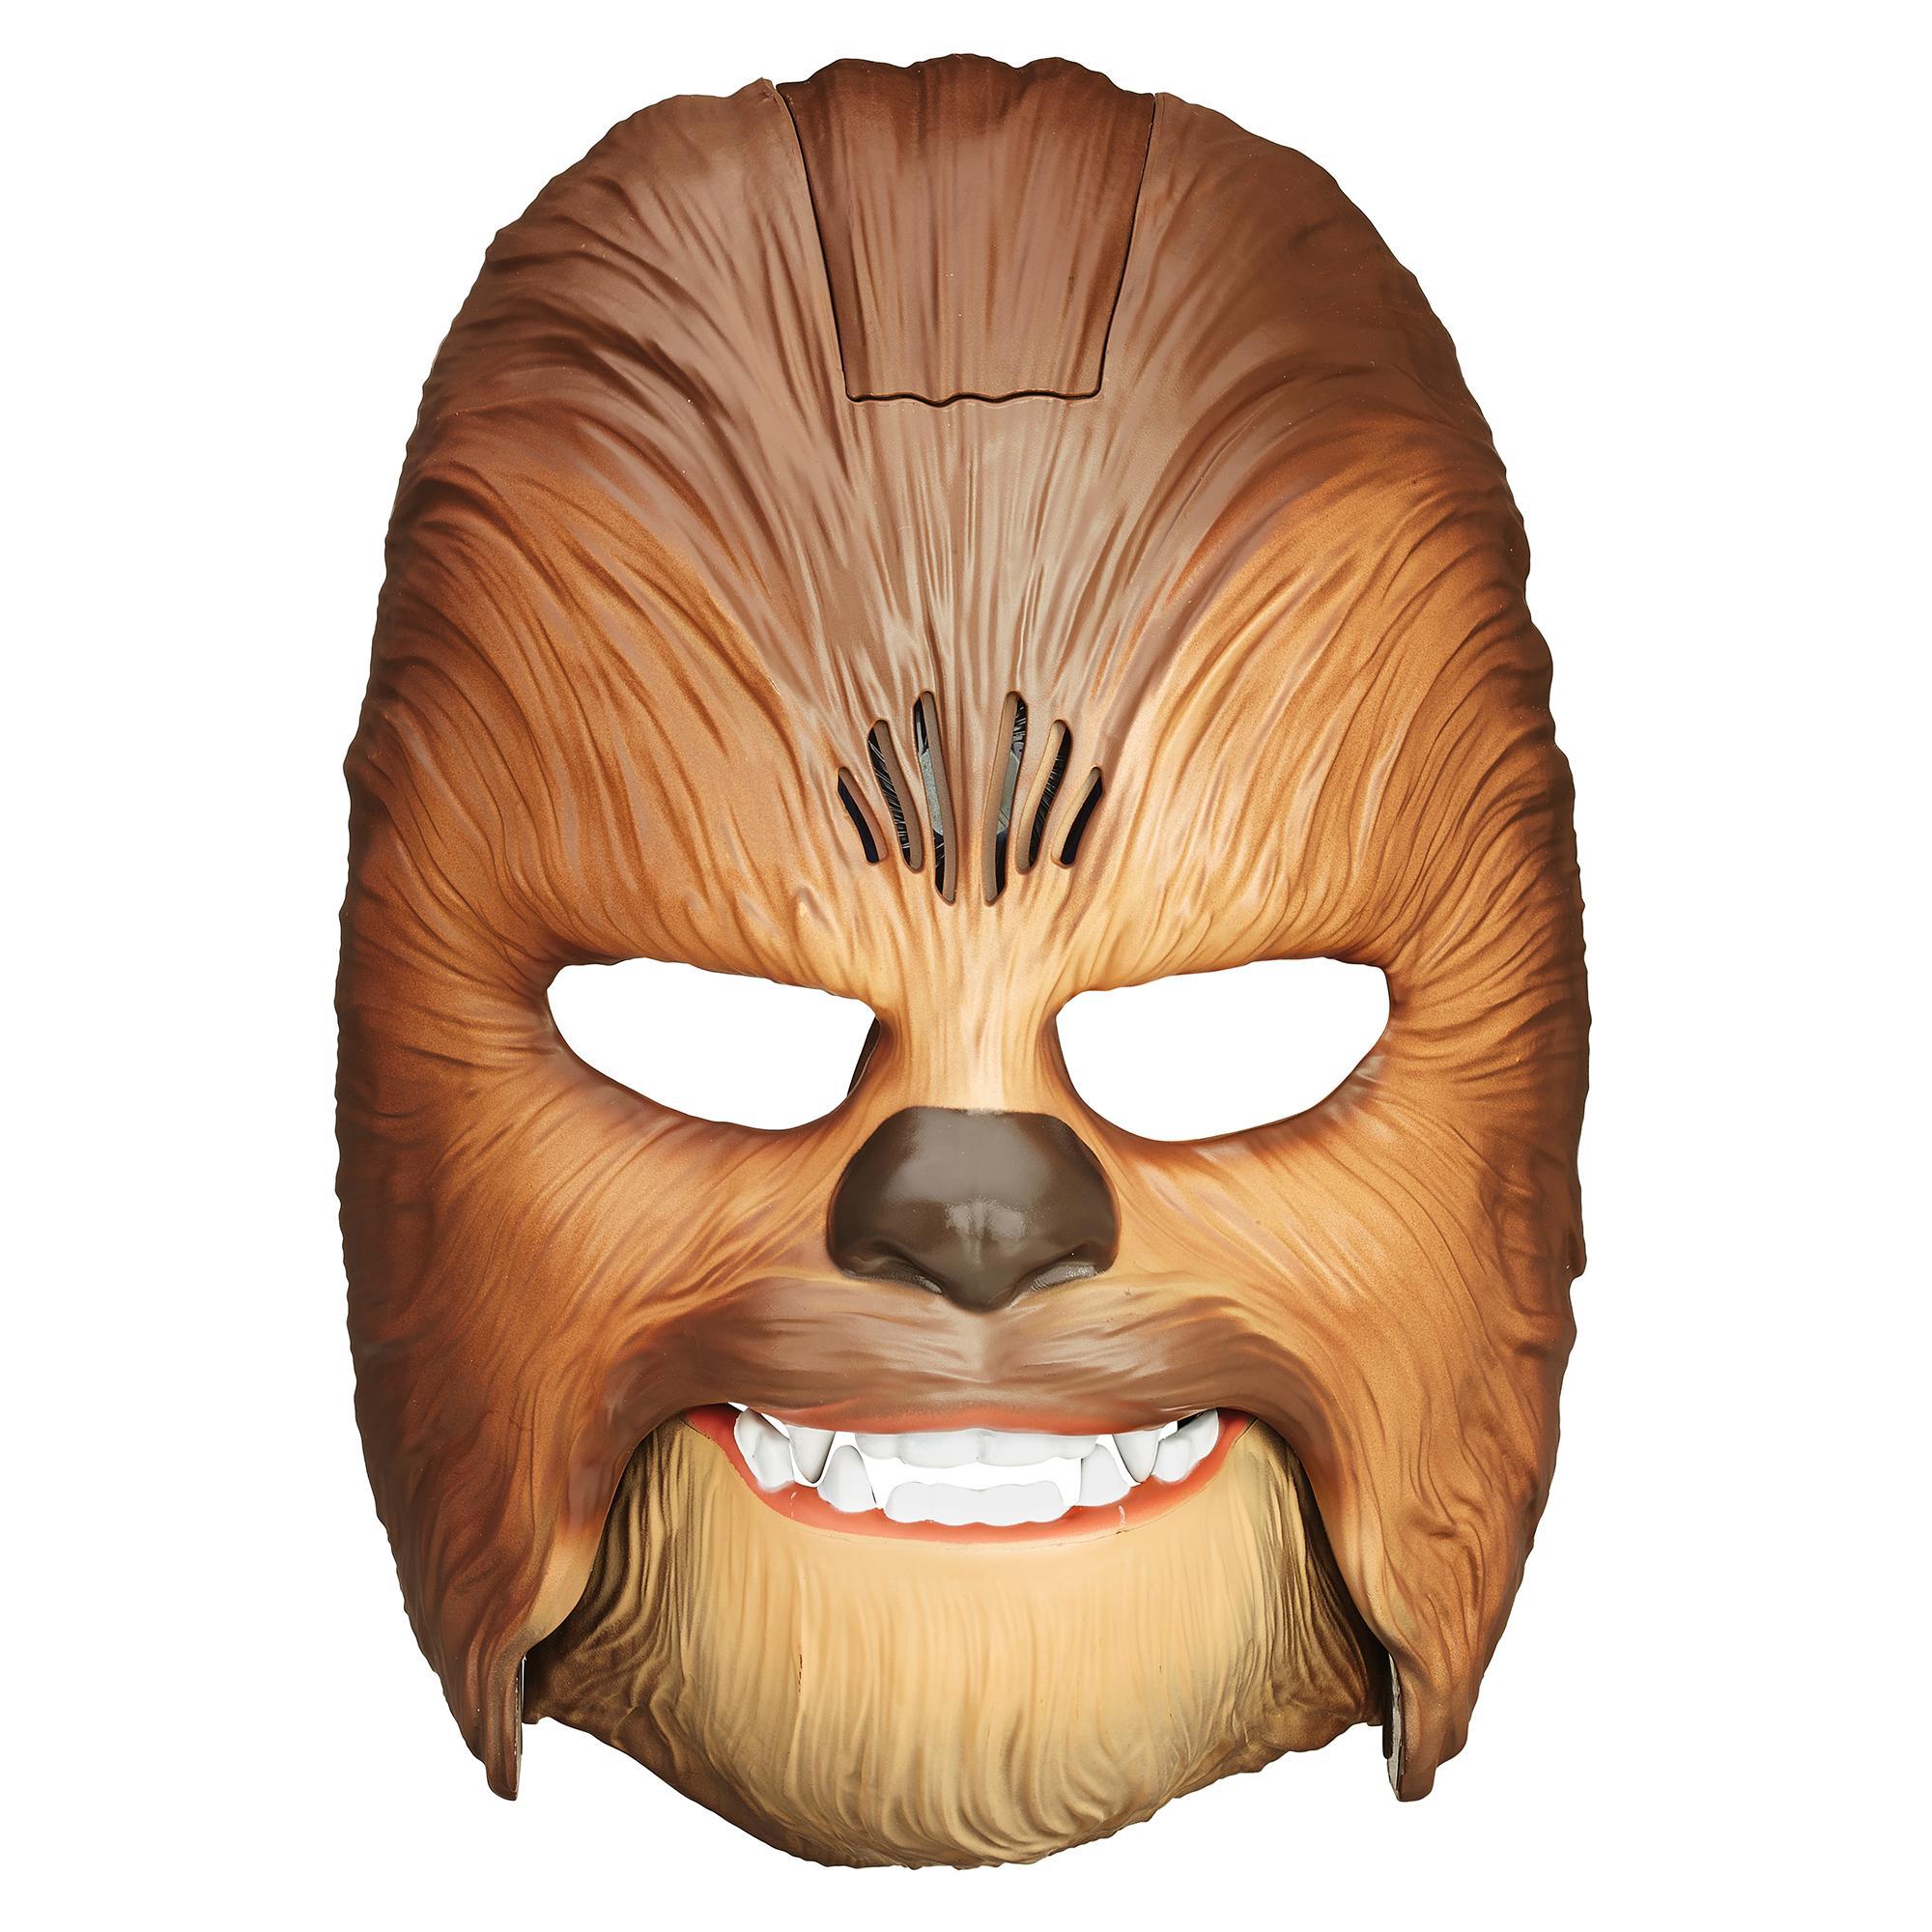 Star Wars The Force Awakens: Elektronisk Chewbacca-maske